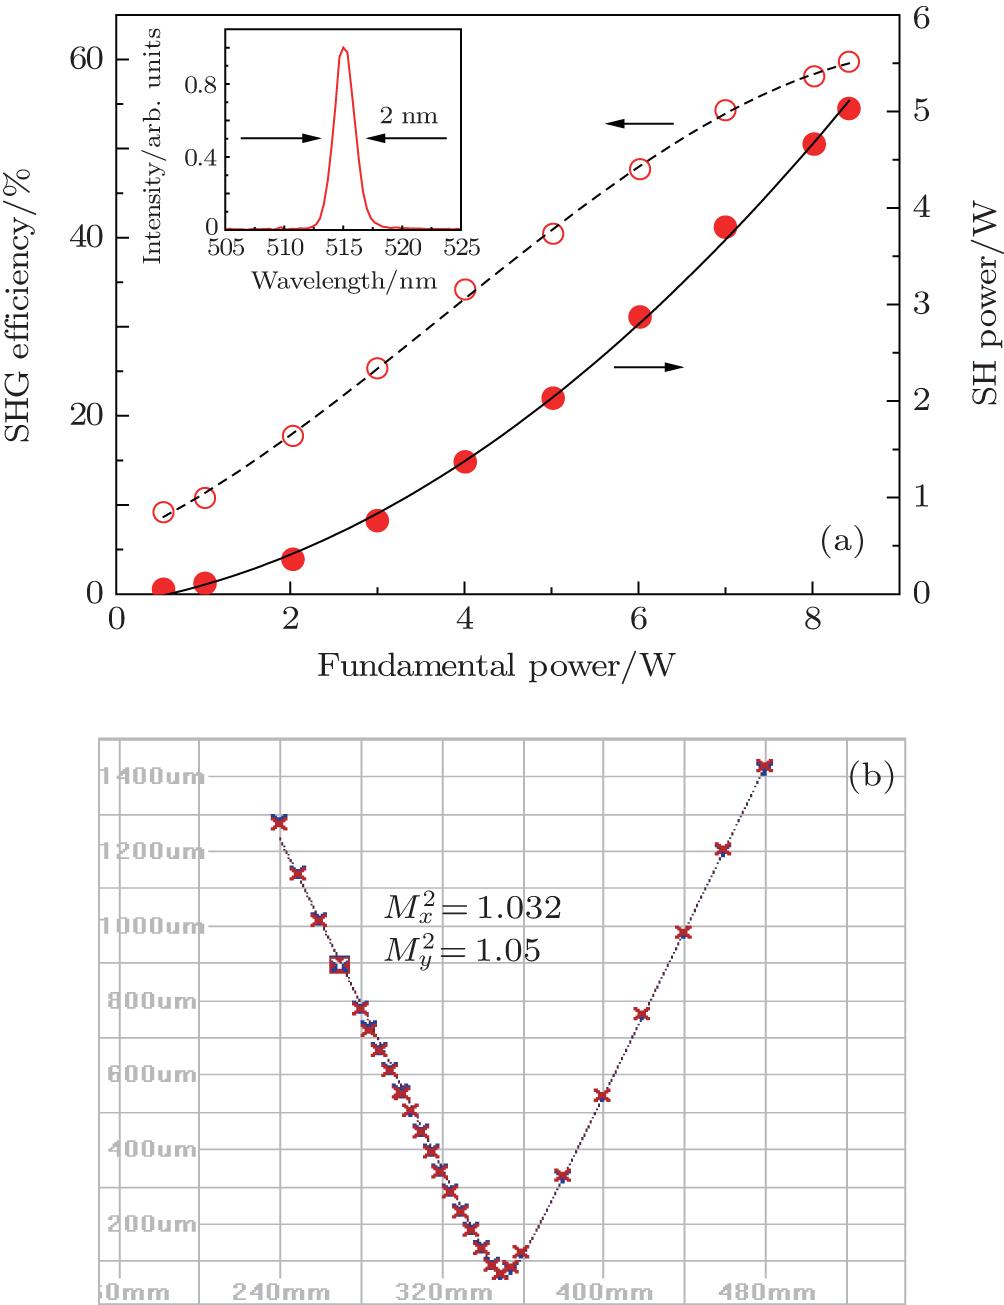 hight resolution of generation of 15w femtosecond laser pulse from a kerr lens mode locked yb yag thin disk oscillator